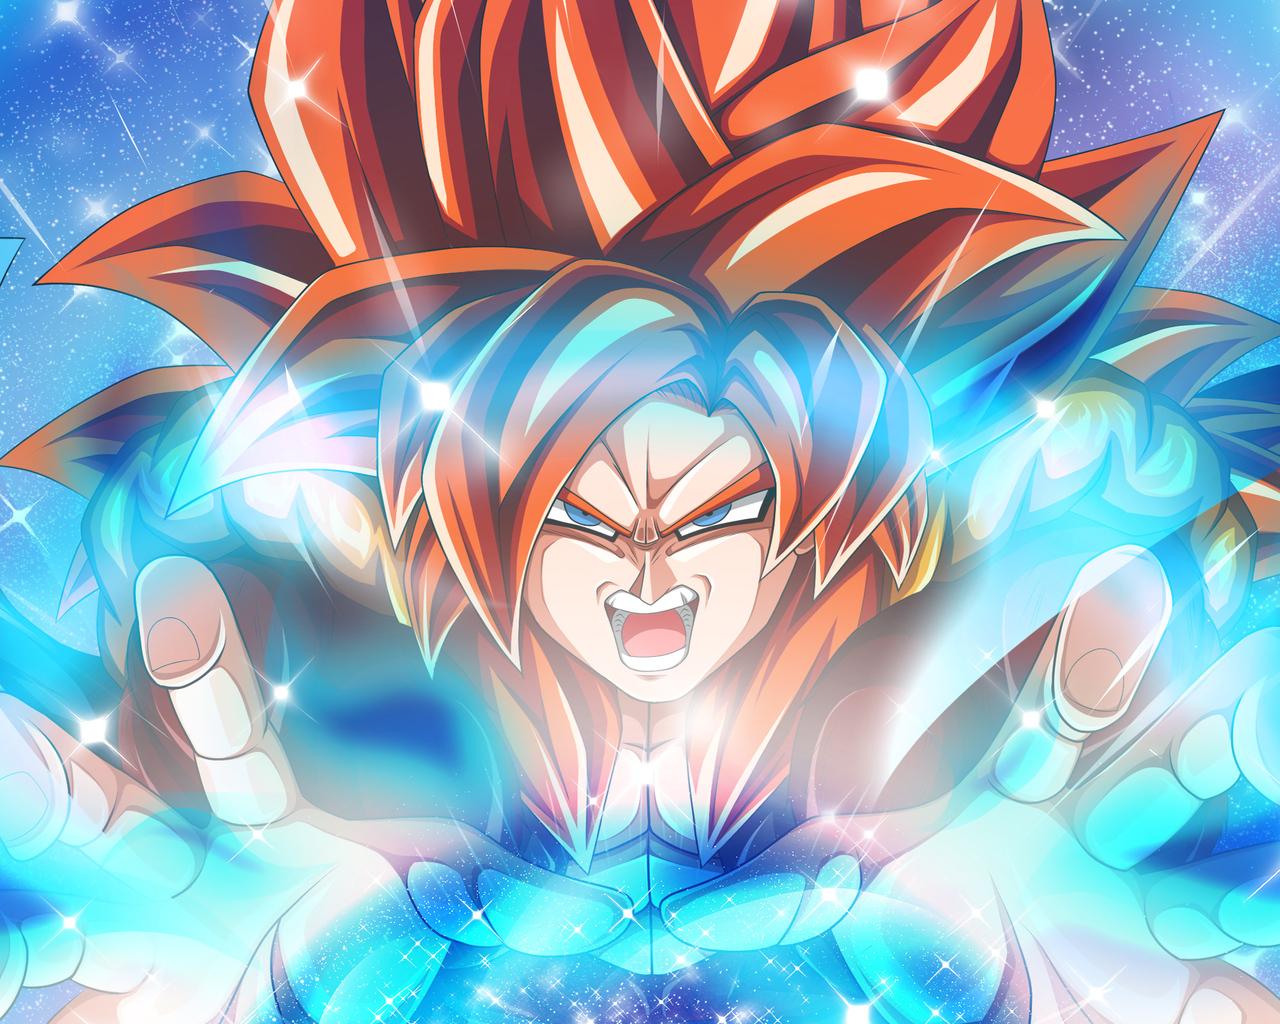 dragon-ball-super-saiyan-4-anime-4k-3h.jpg